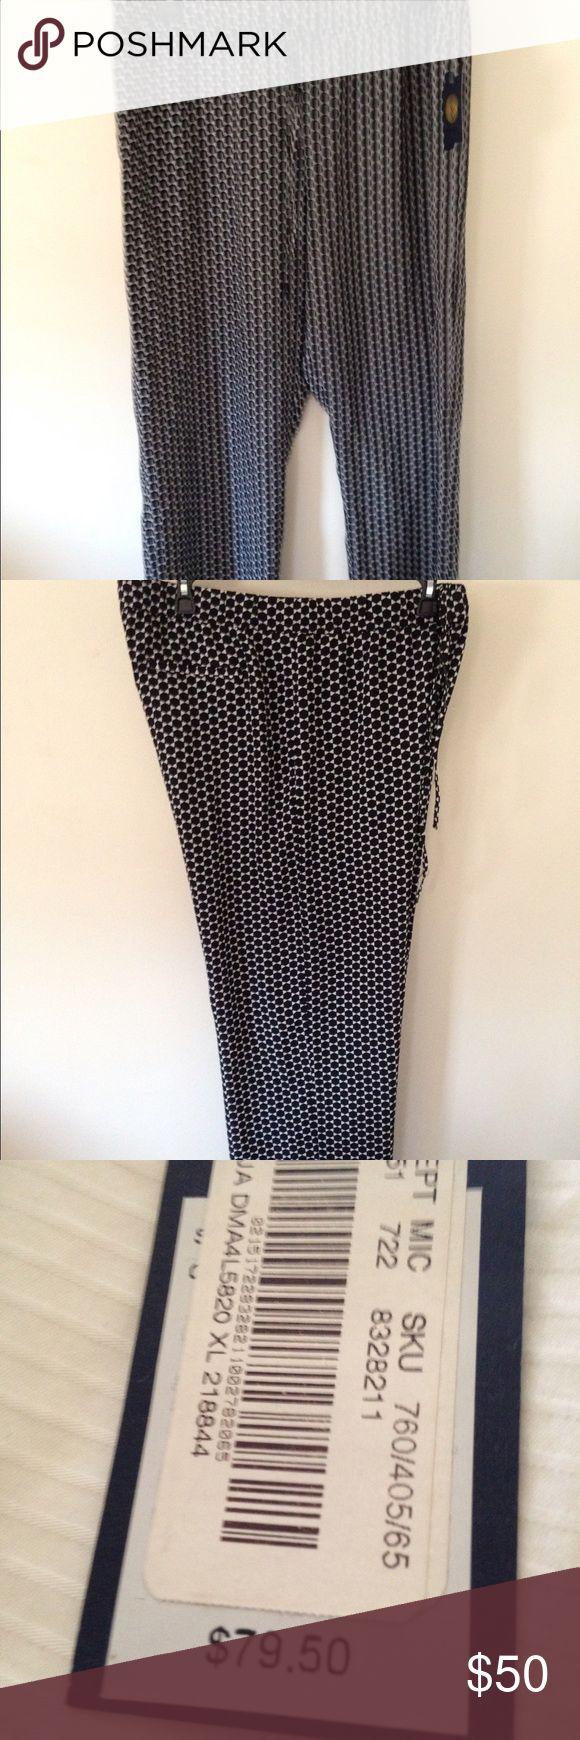 Blue and white soft pants - BRAND NEW NEVER WORN soft pants!! Adrienne Vittadini Pants Wide Leg